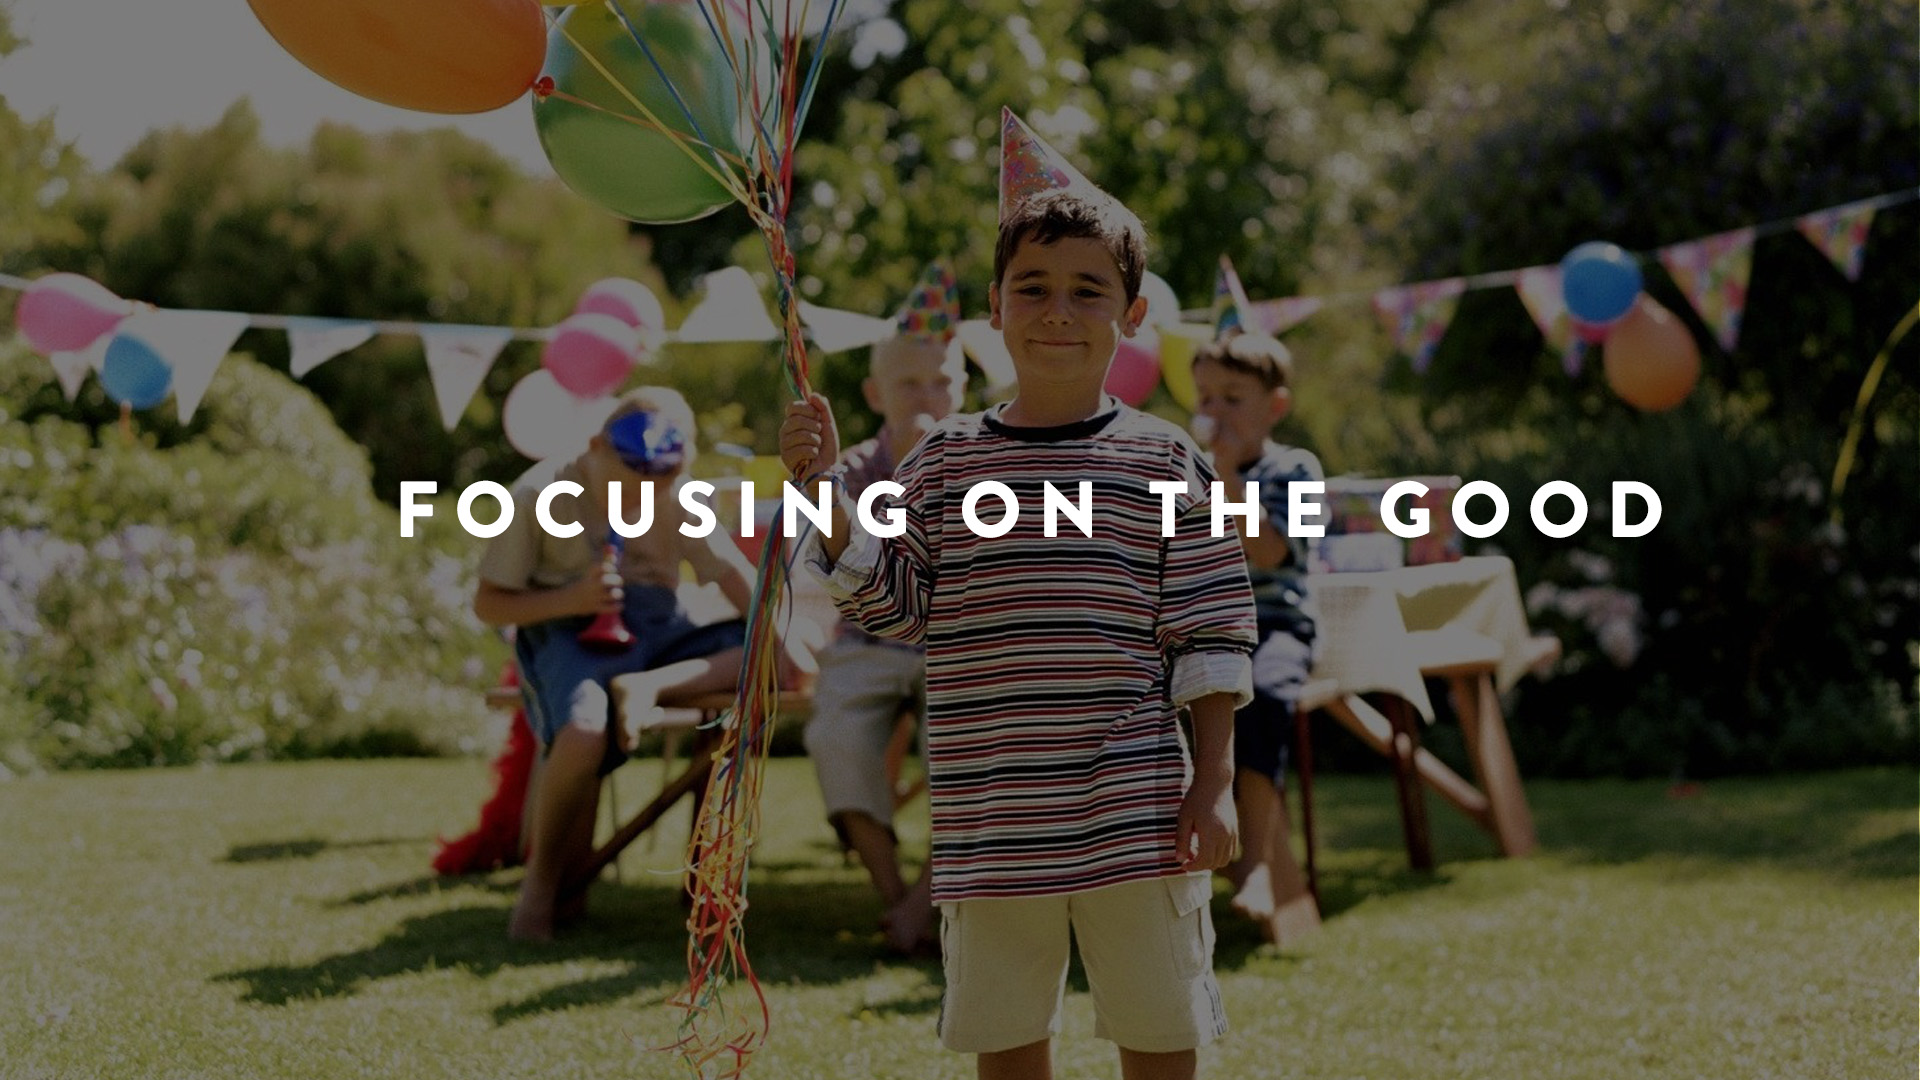 Focusing on the Good